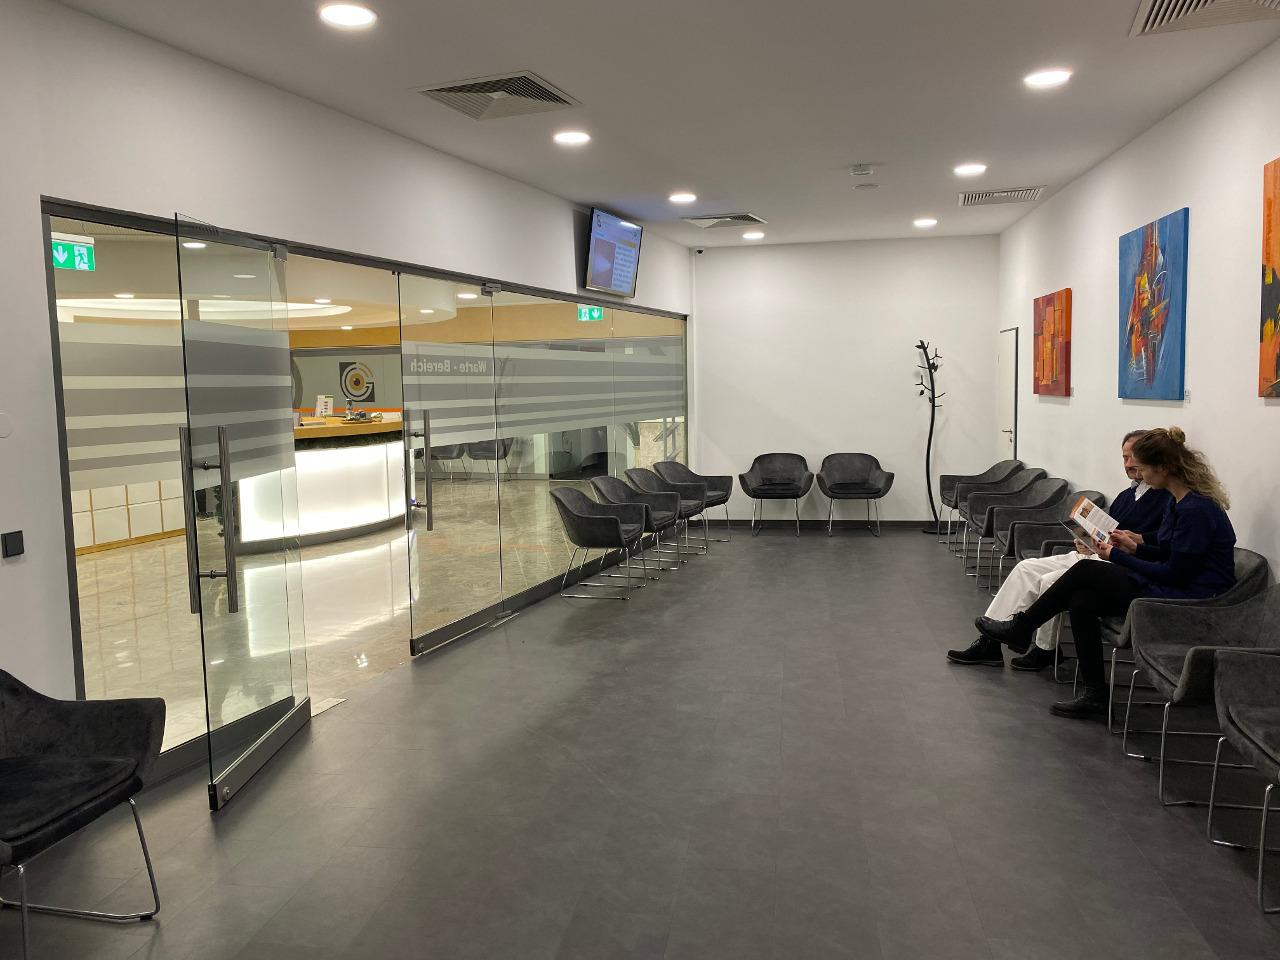 Praxis Dr. Hierschbiel Wartezimmer